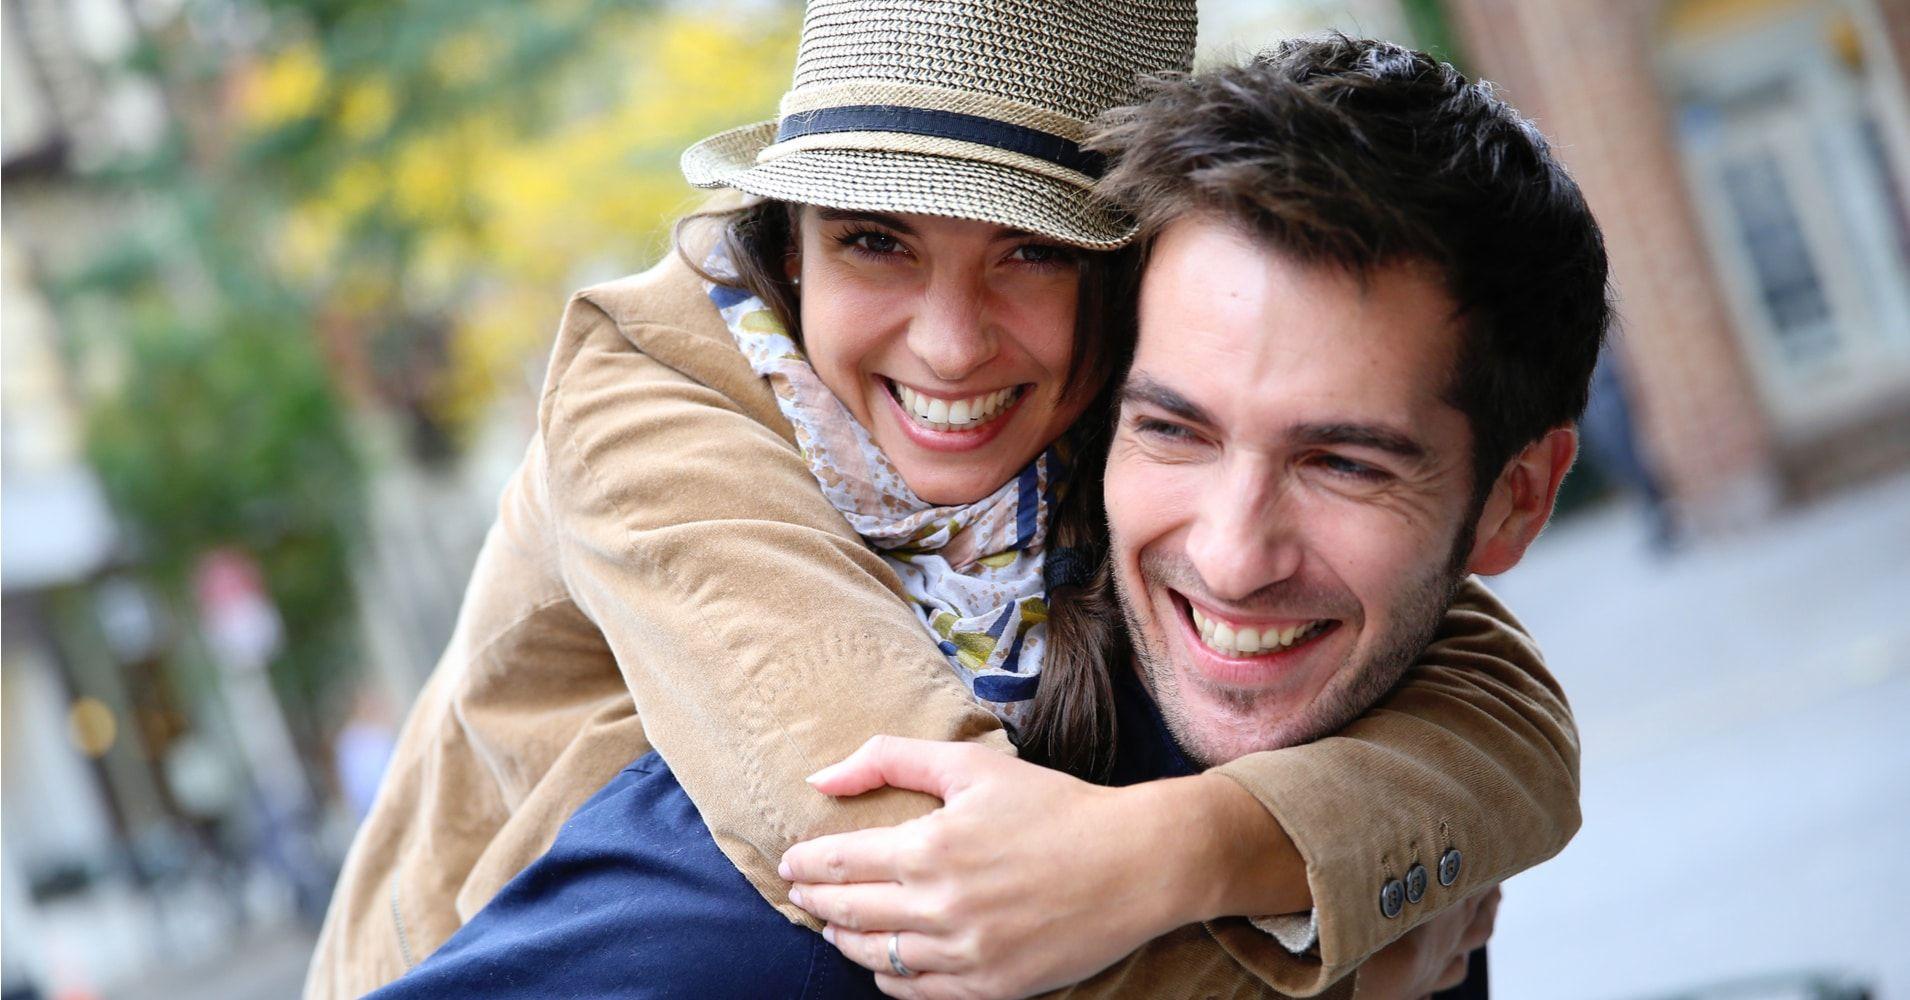 Top us städte für black and latino dating